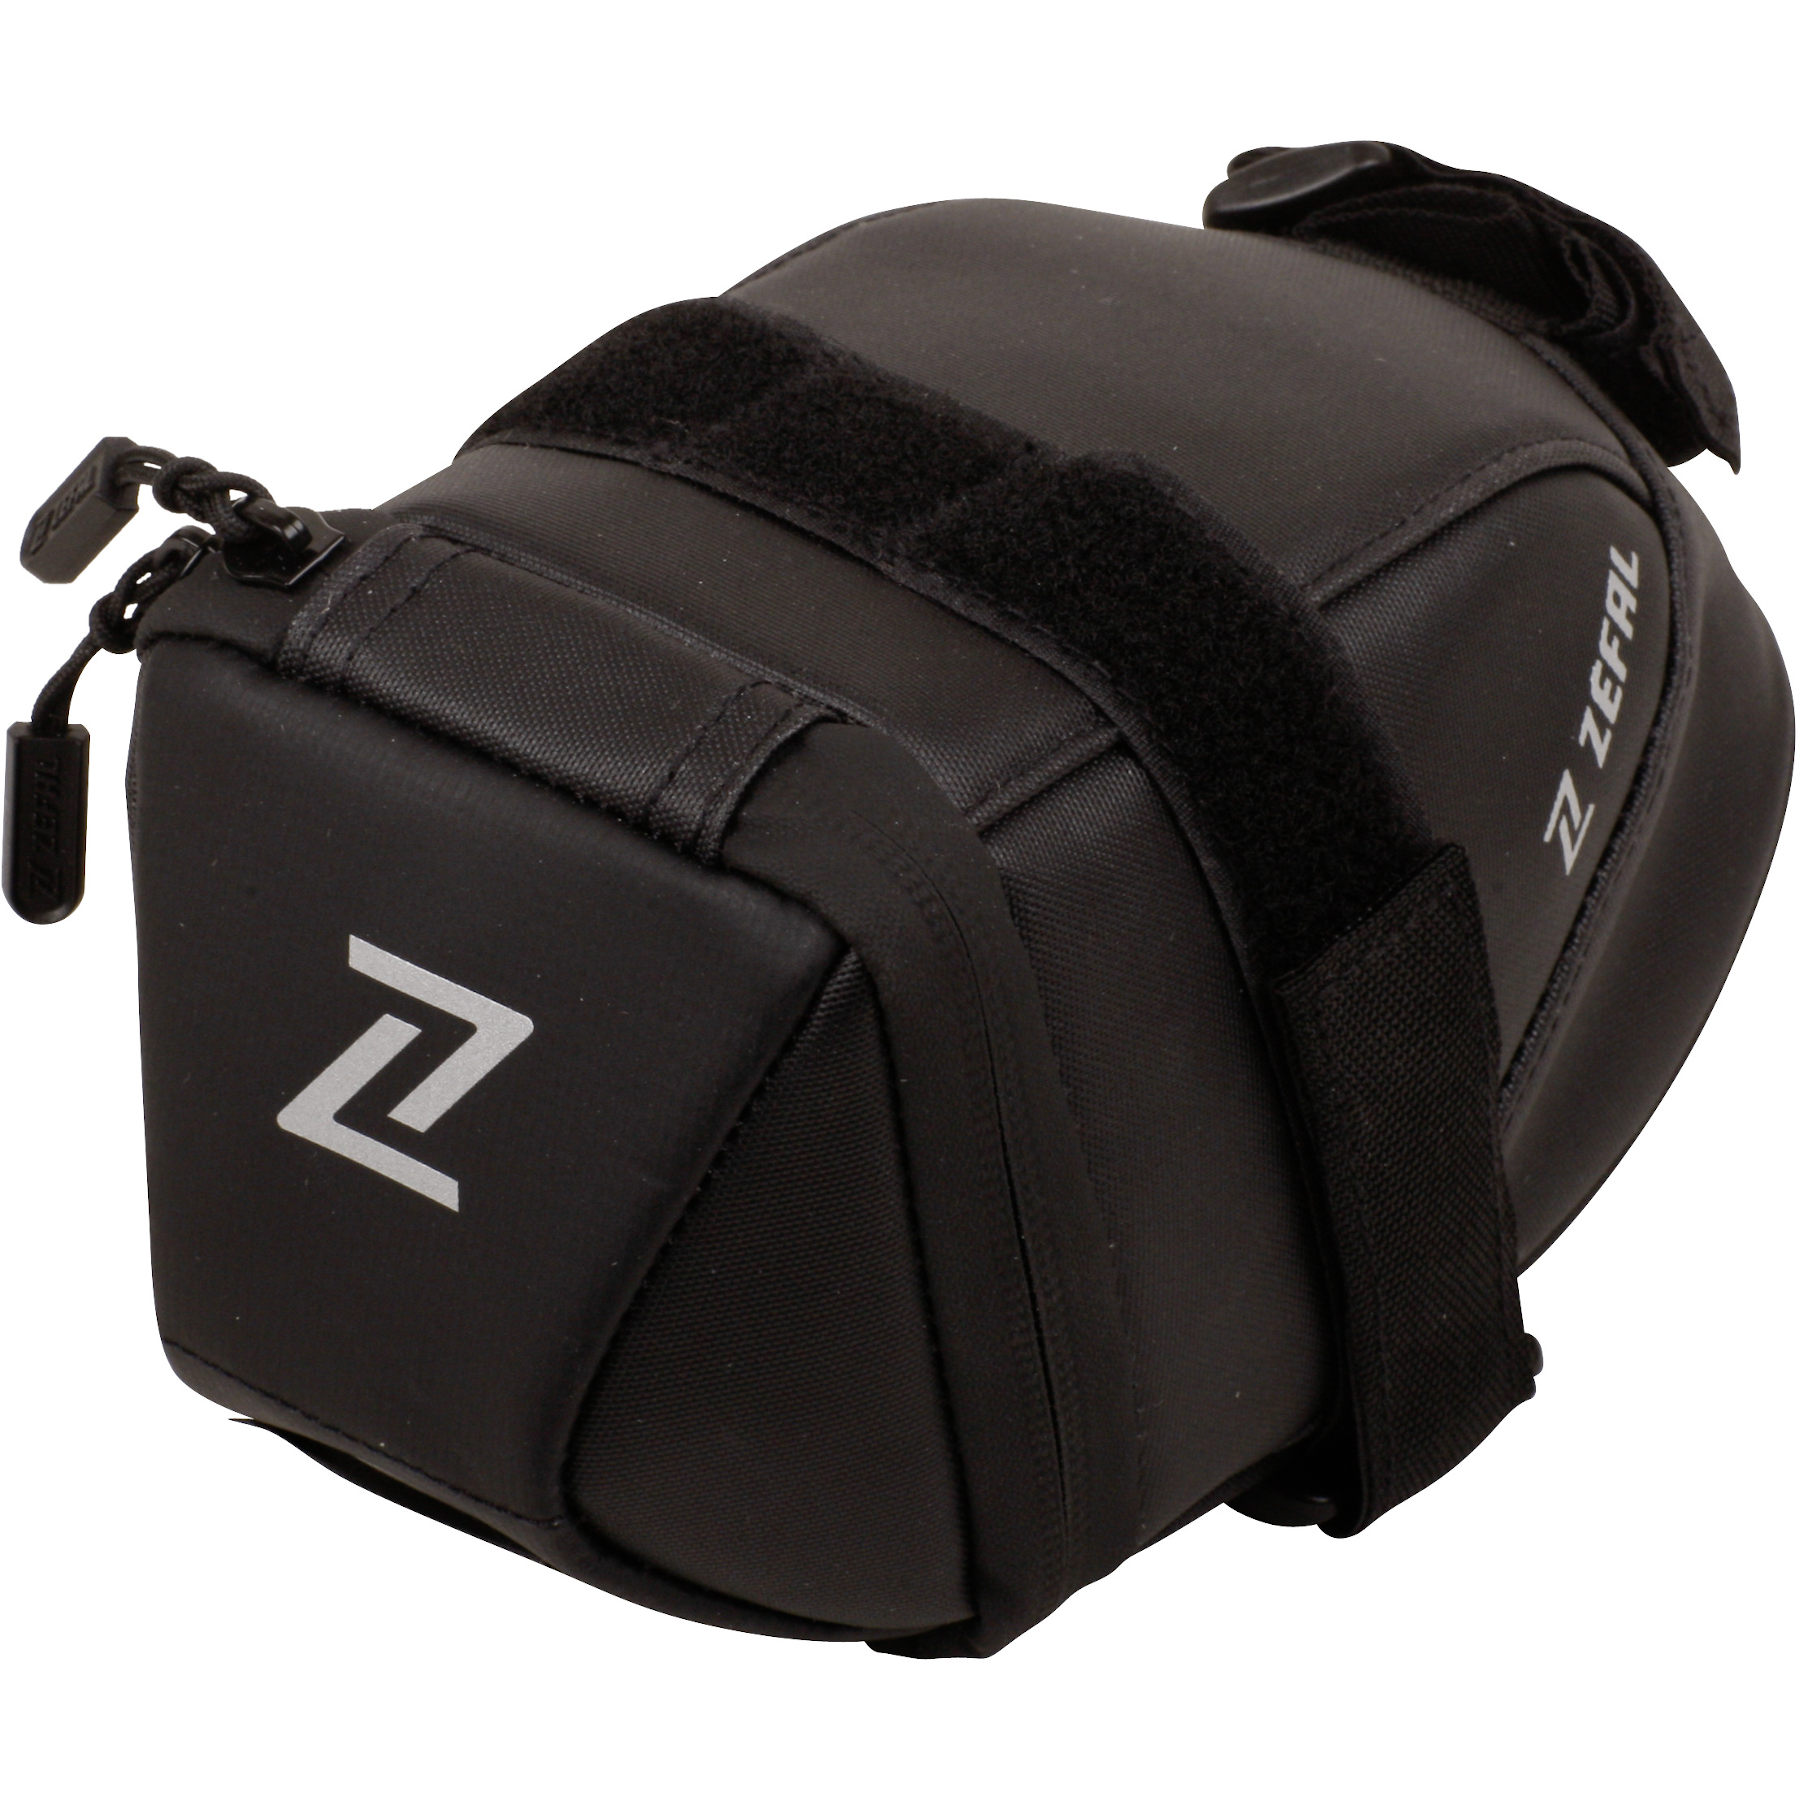 Zéfal Iron Pack 2 M-DS Saddle Bag 0.9 l - black